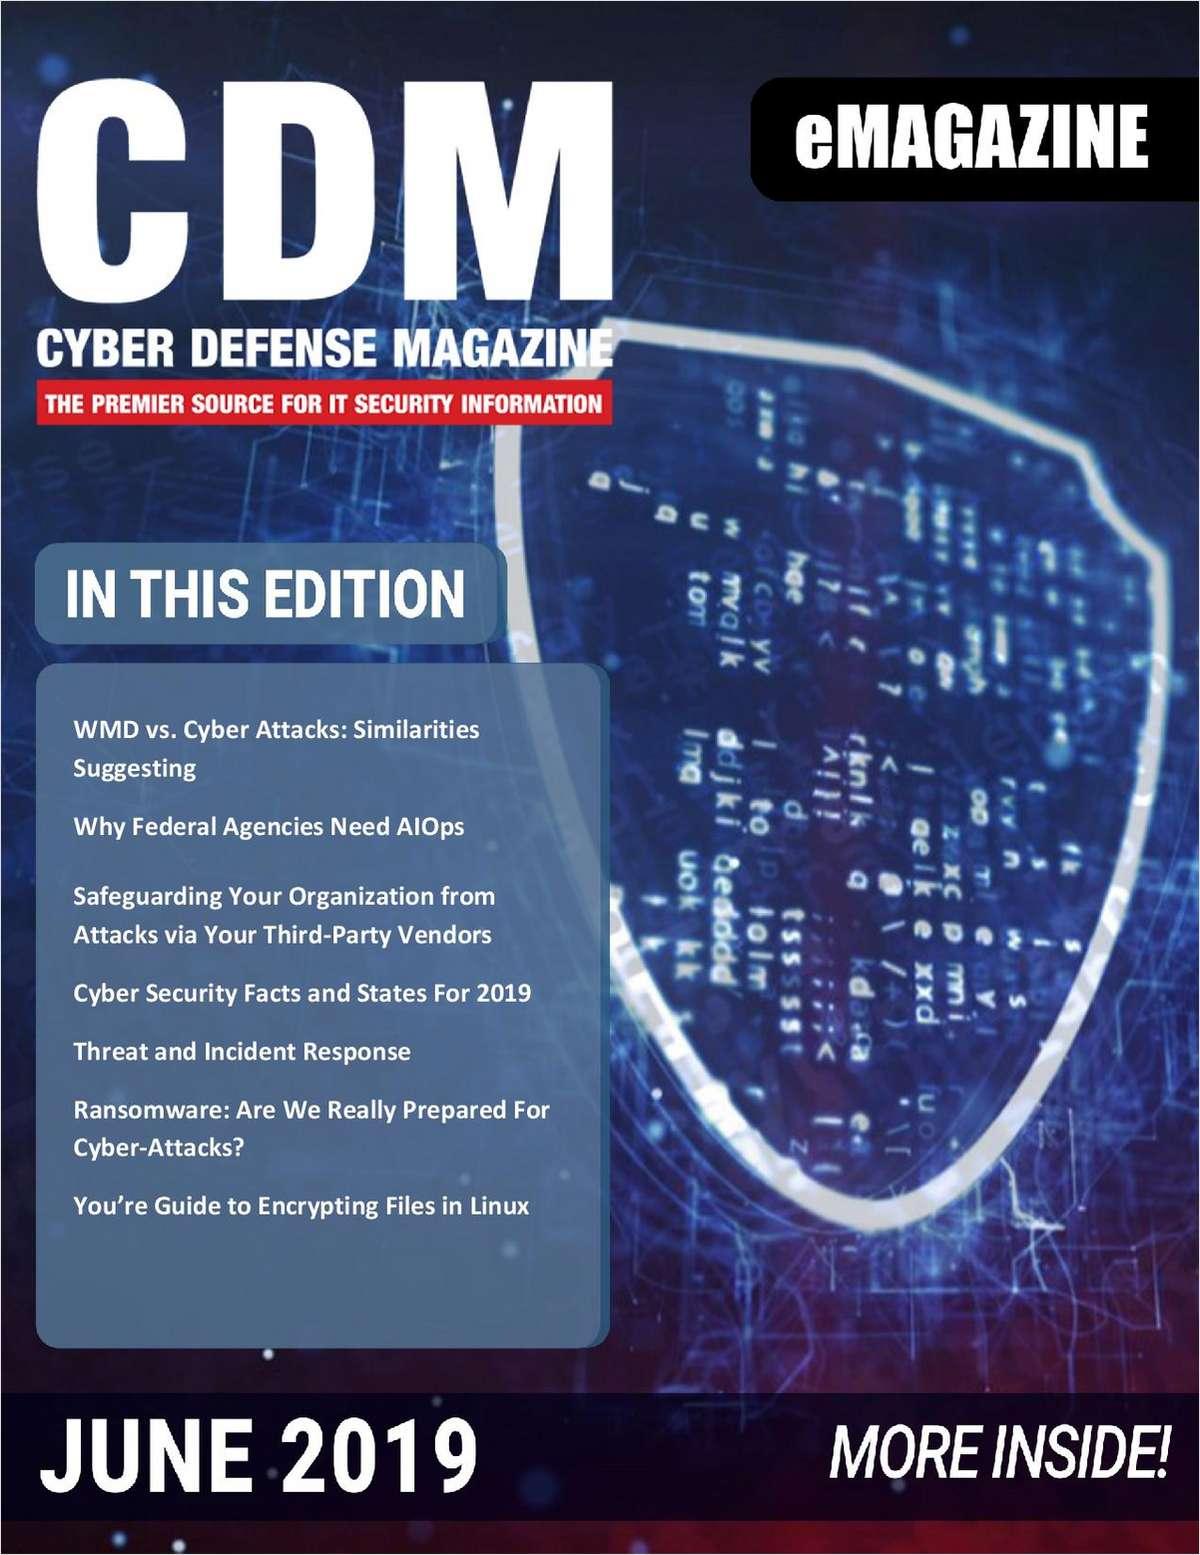 Cyber Defense eMagazine - June 2019 Edition